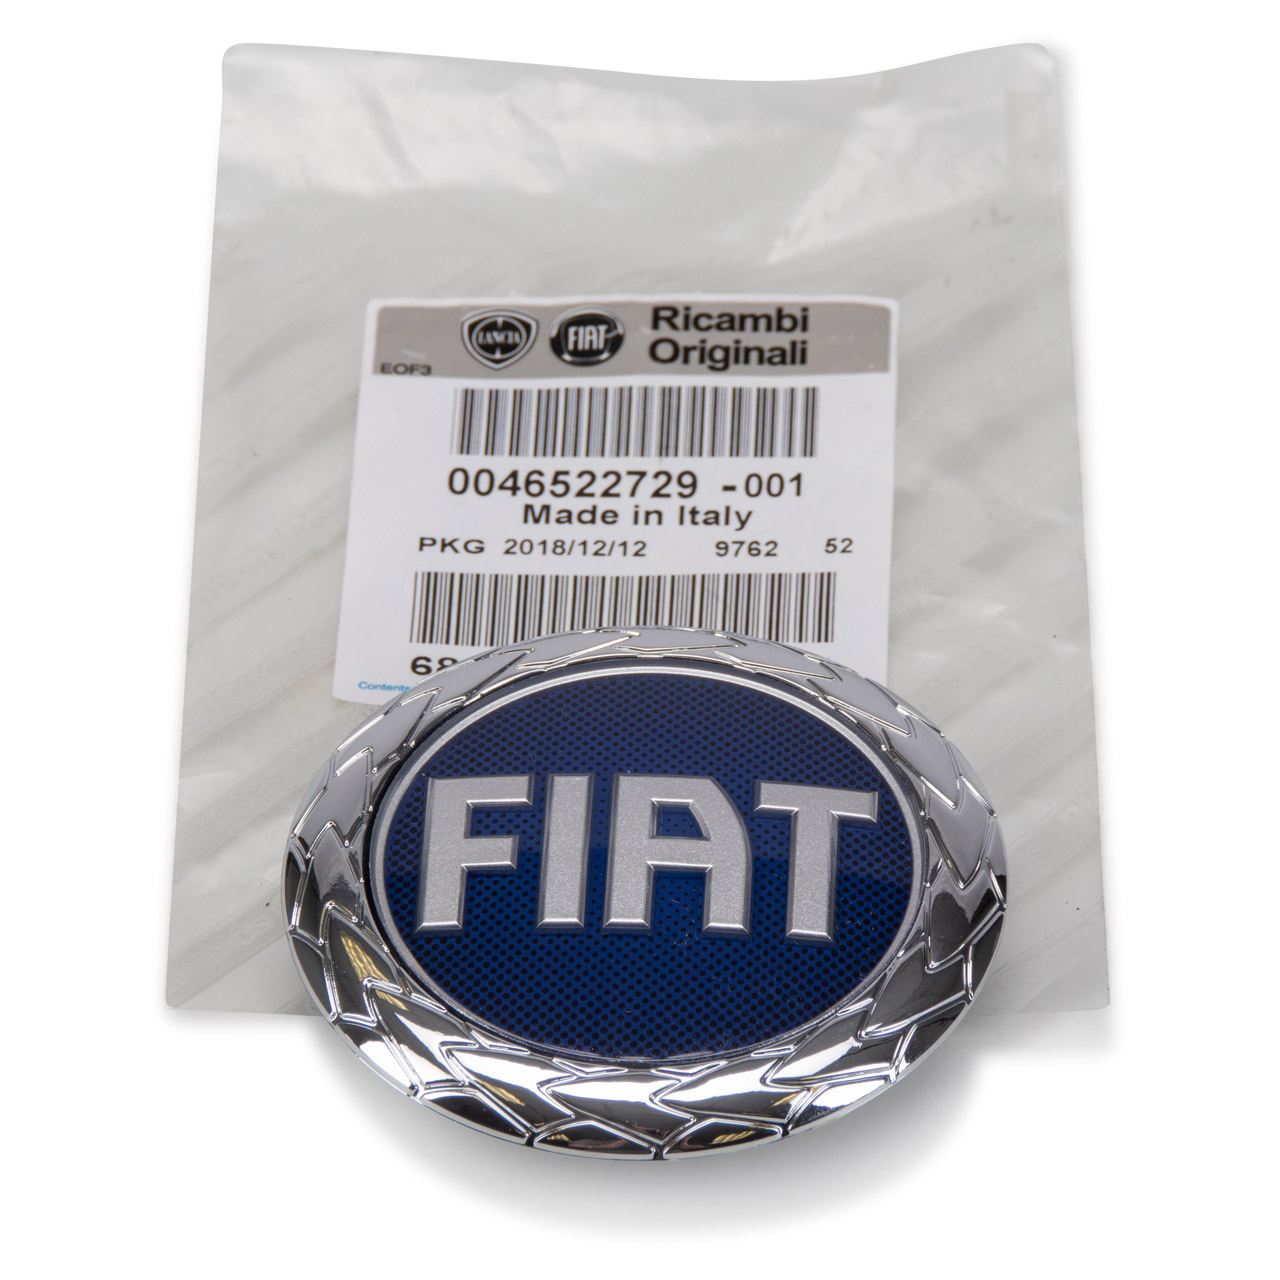 ORIGINAL Fiat Emblem Logo Kühlergrill BARCHETTA DOBLO PUNTO (188) 46522729